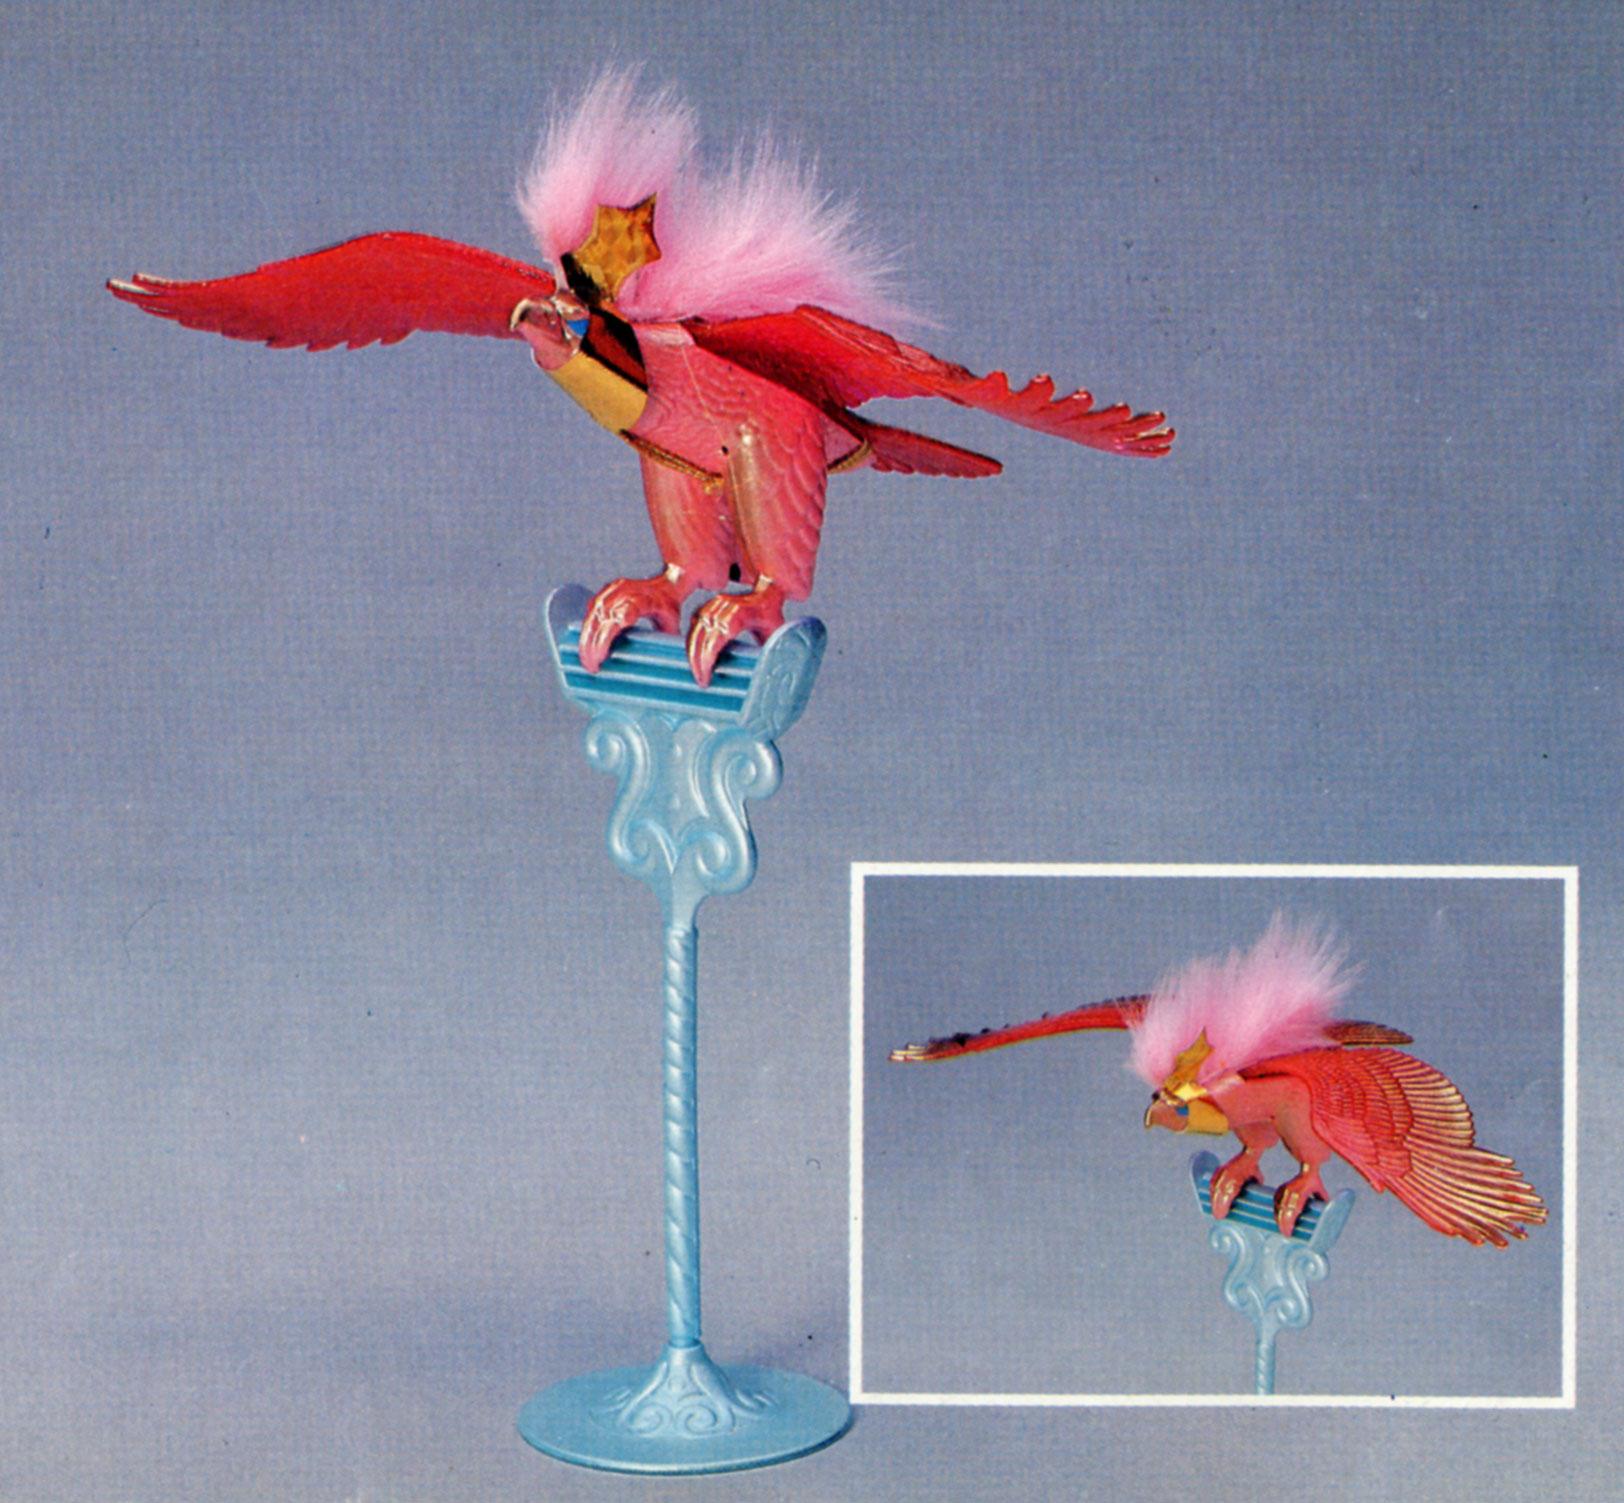 He-Man.org > Toys > Prototypes & Concept Art > Princess of Power > Glory  Bird